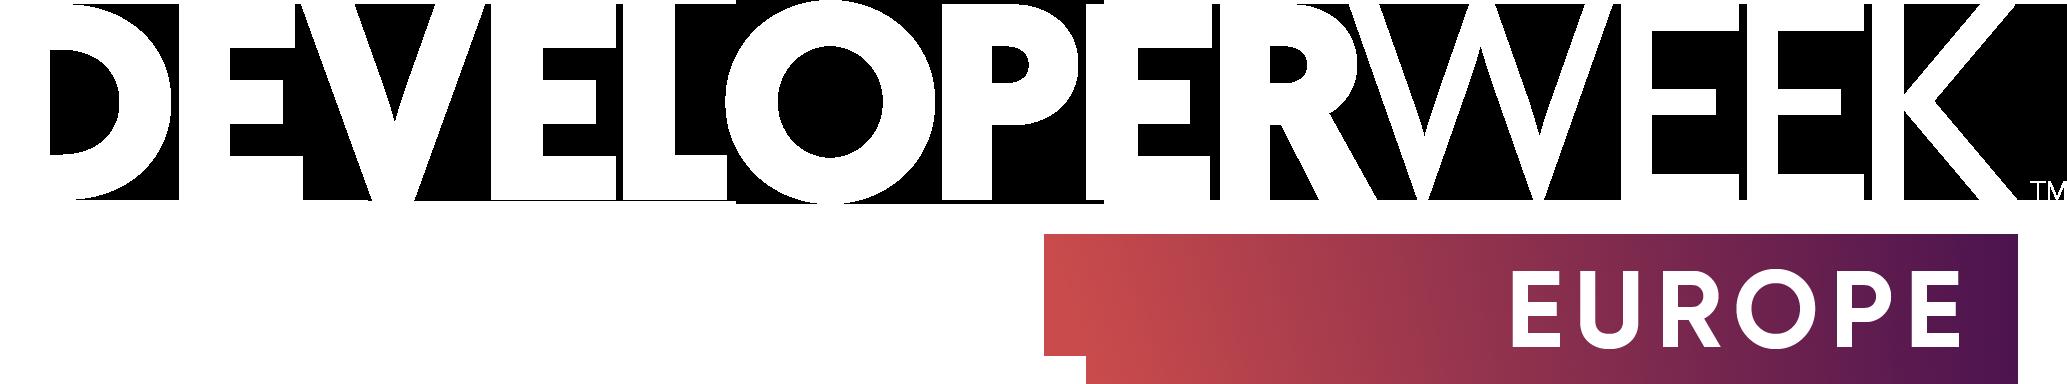 DeveloperWeek Europe